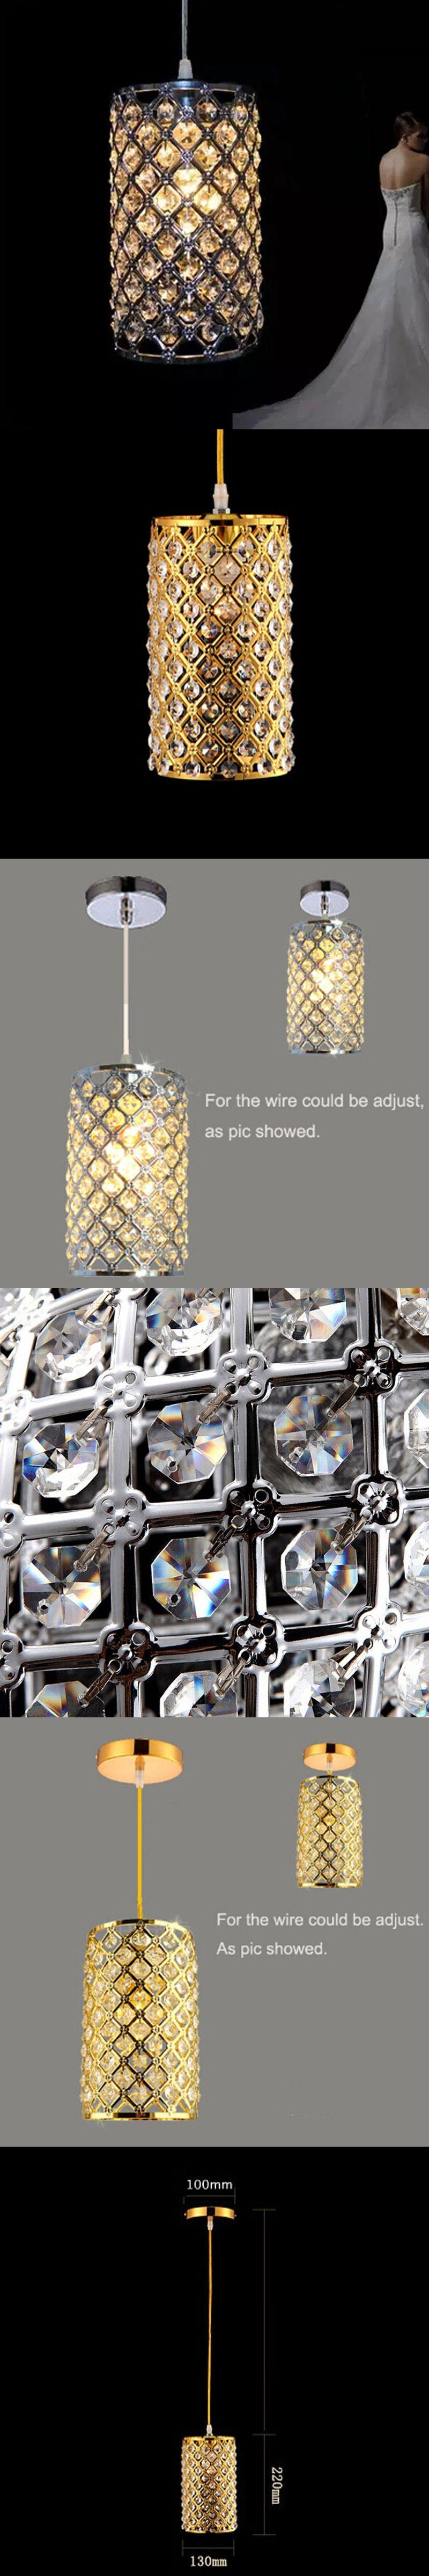 Modern single led gold crystal chandeliers lights modern crystal modern single led gold crystal chandeliers lights modern crystal lamps aisle high power lights aloadofball Images